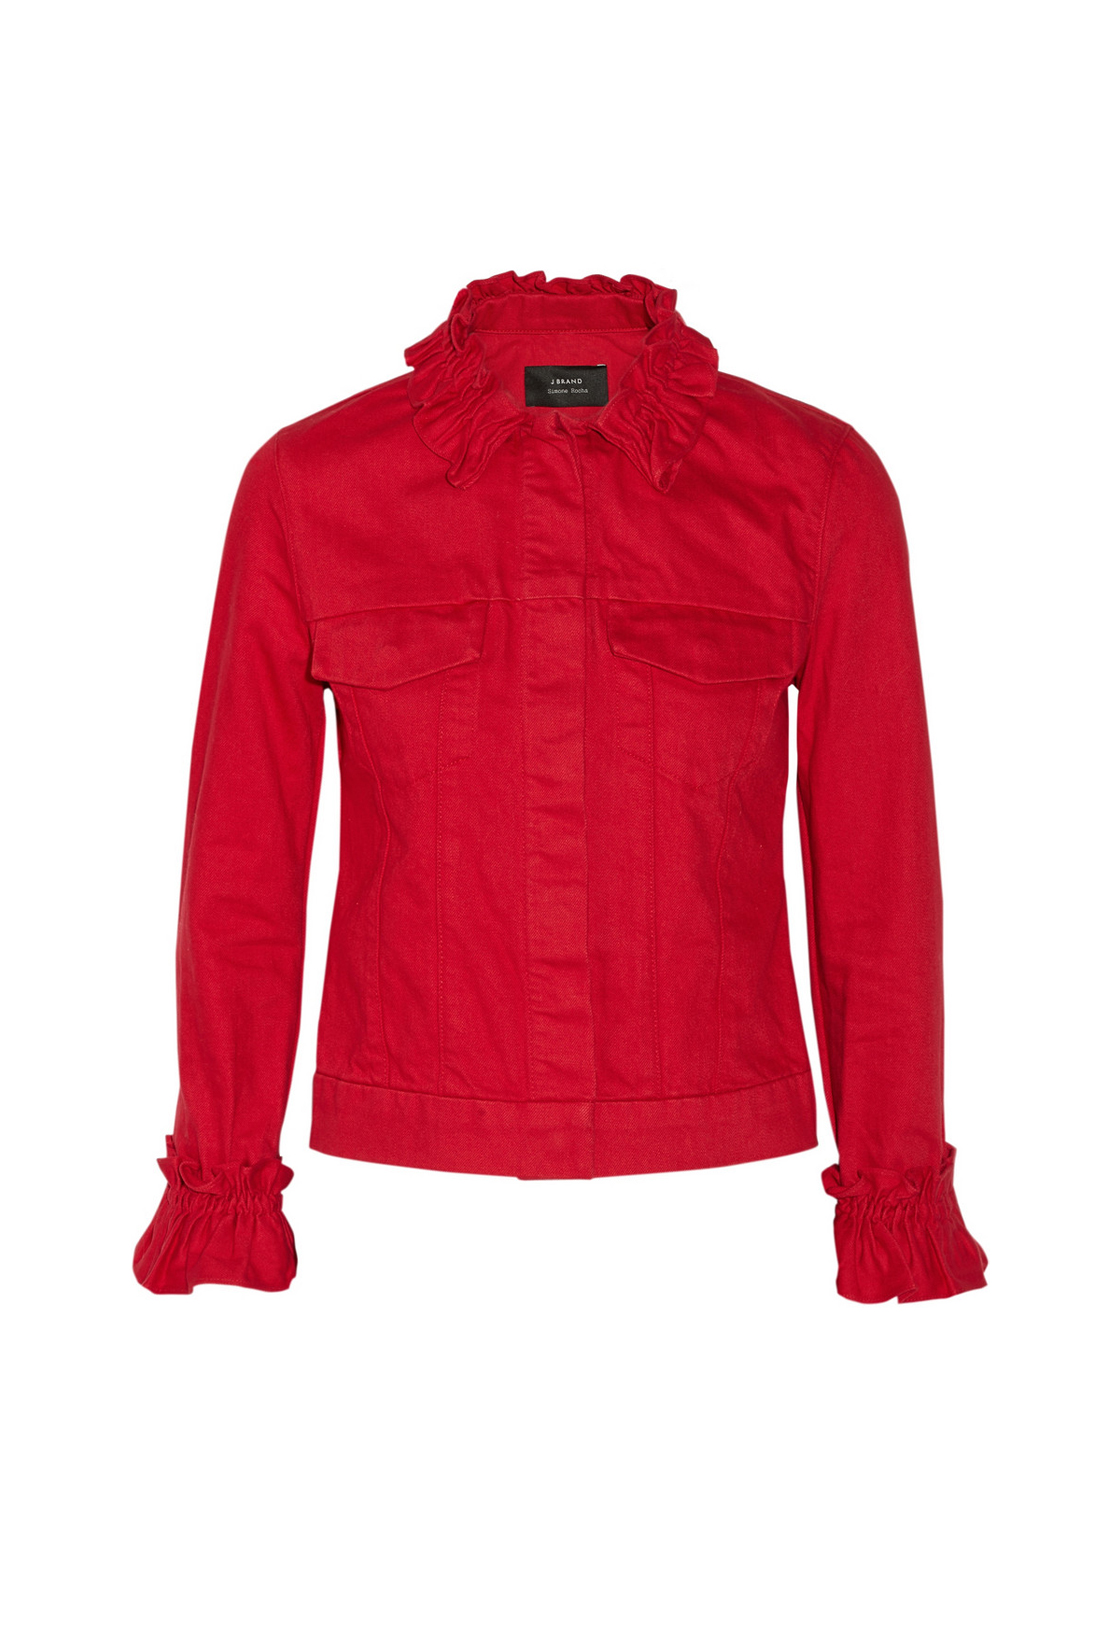 08-spring-denim-trends-shrunken-jackets-02.jpg